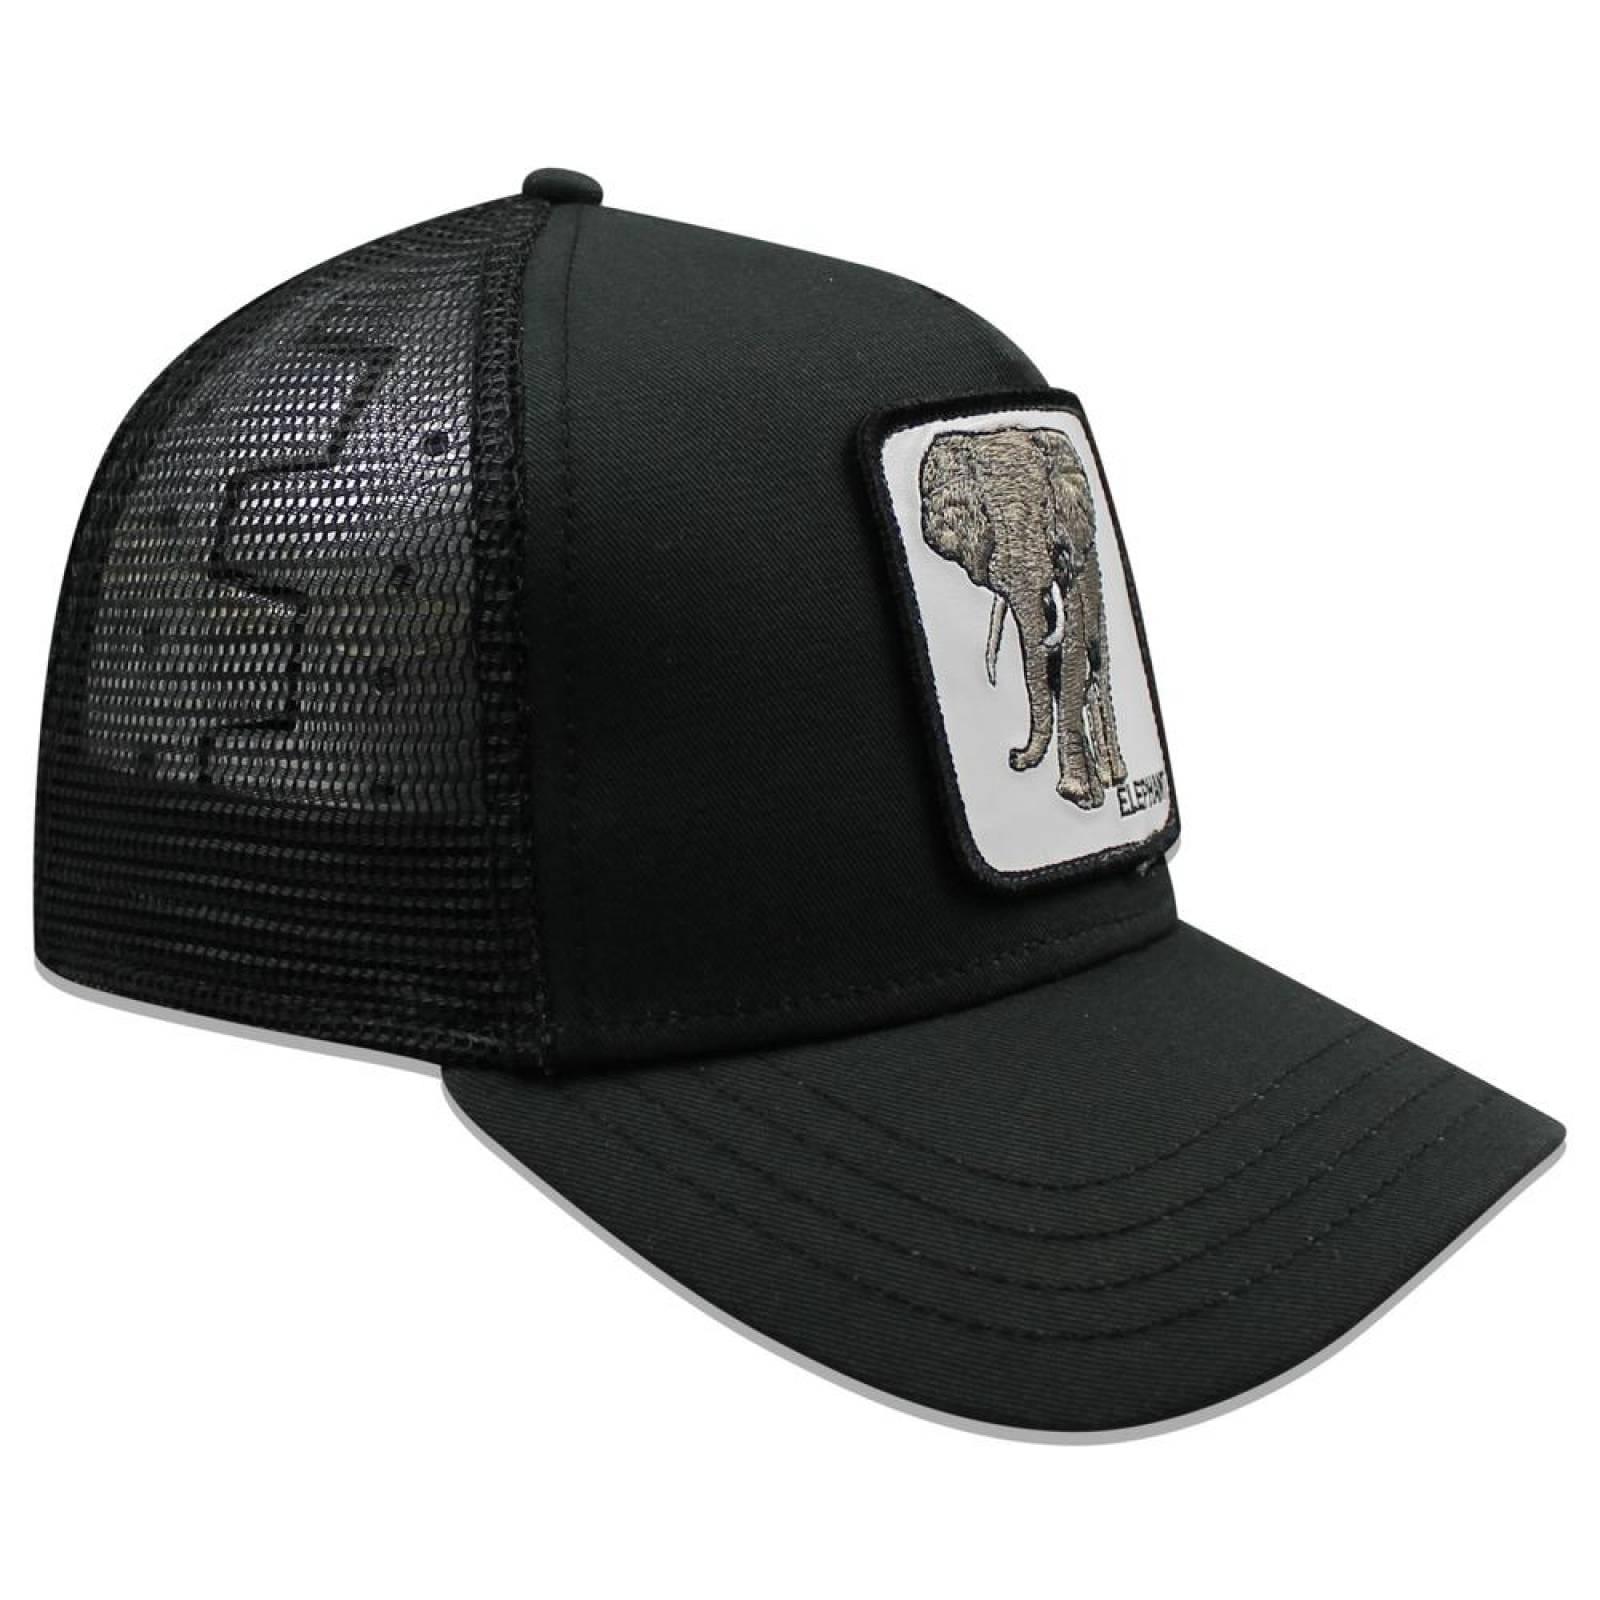 Gorra Goorin Bros Trucker Big Heart Elefante 1010561 Negro